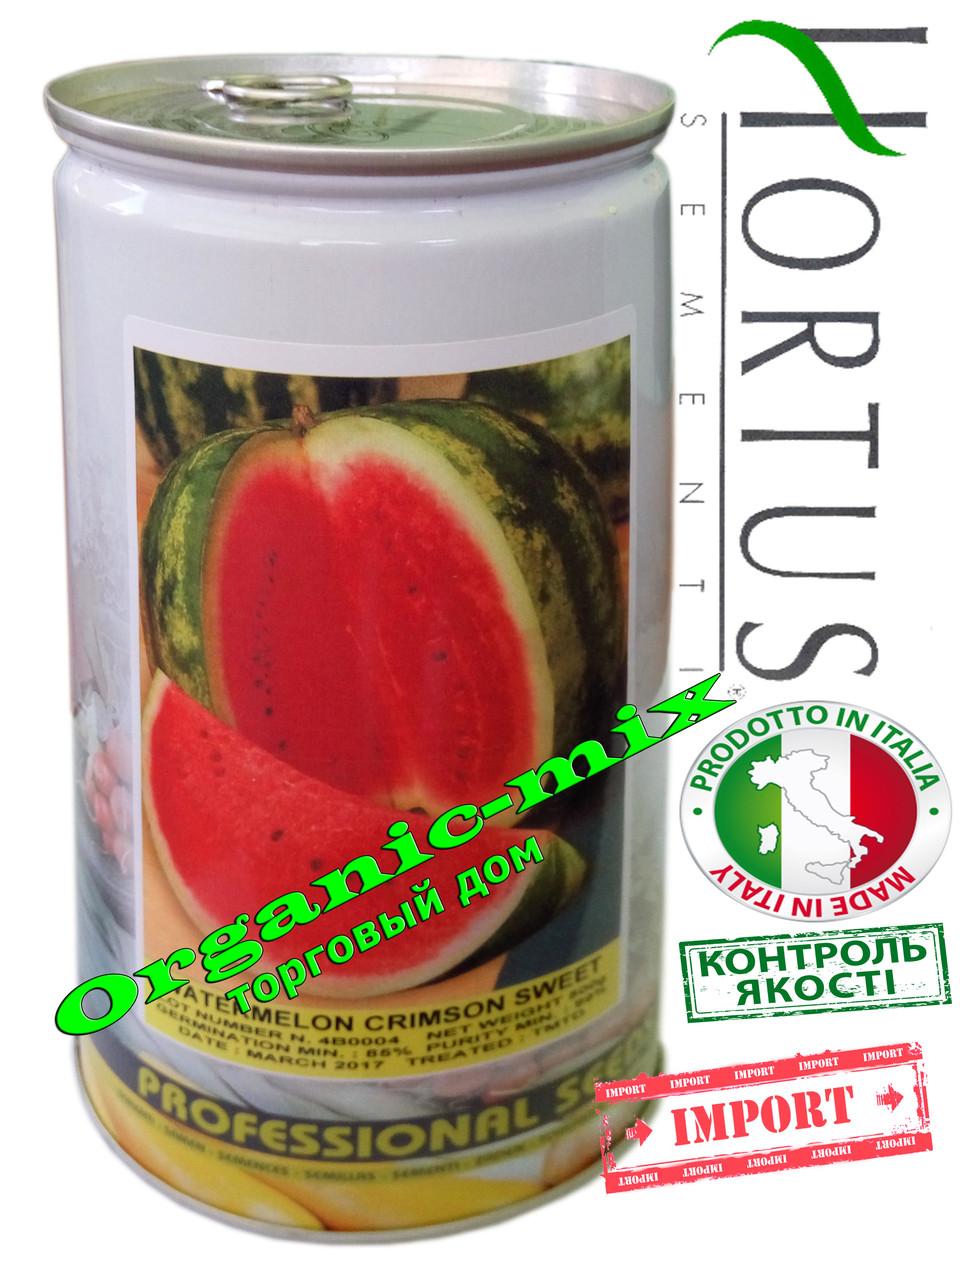 Семена арбуза, КРИМСОН СВИТ / CRIMSON SWEET, ТМ HORTUS (ITALY), банка 500 грамм